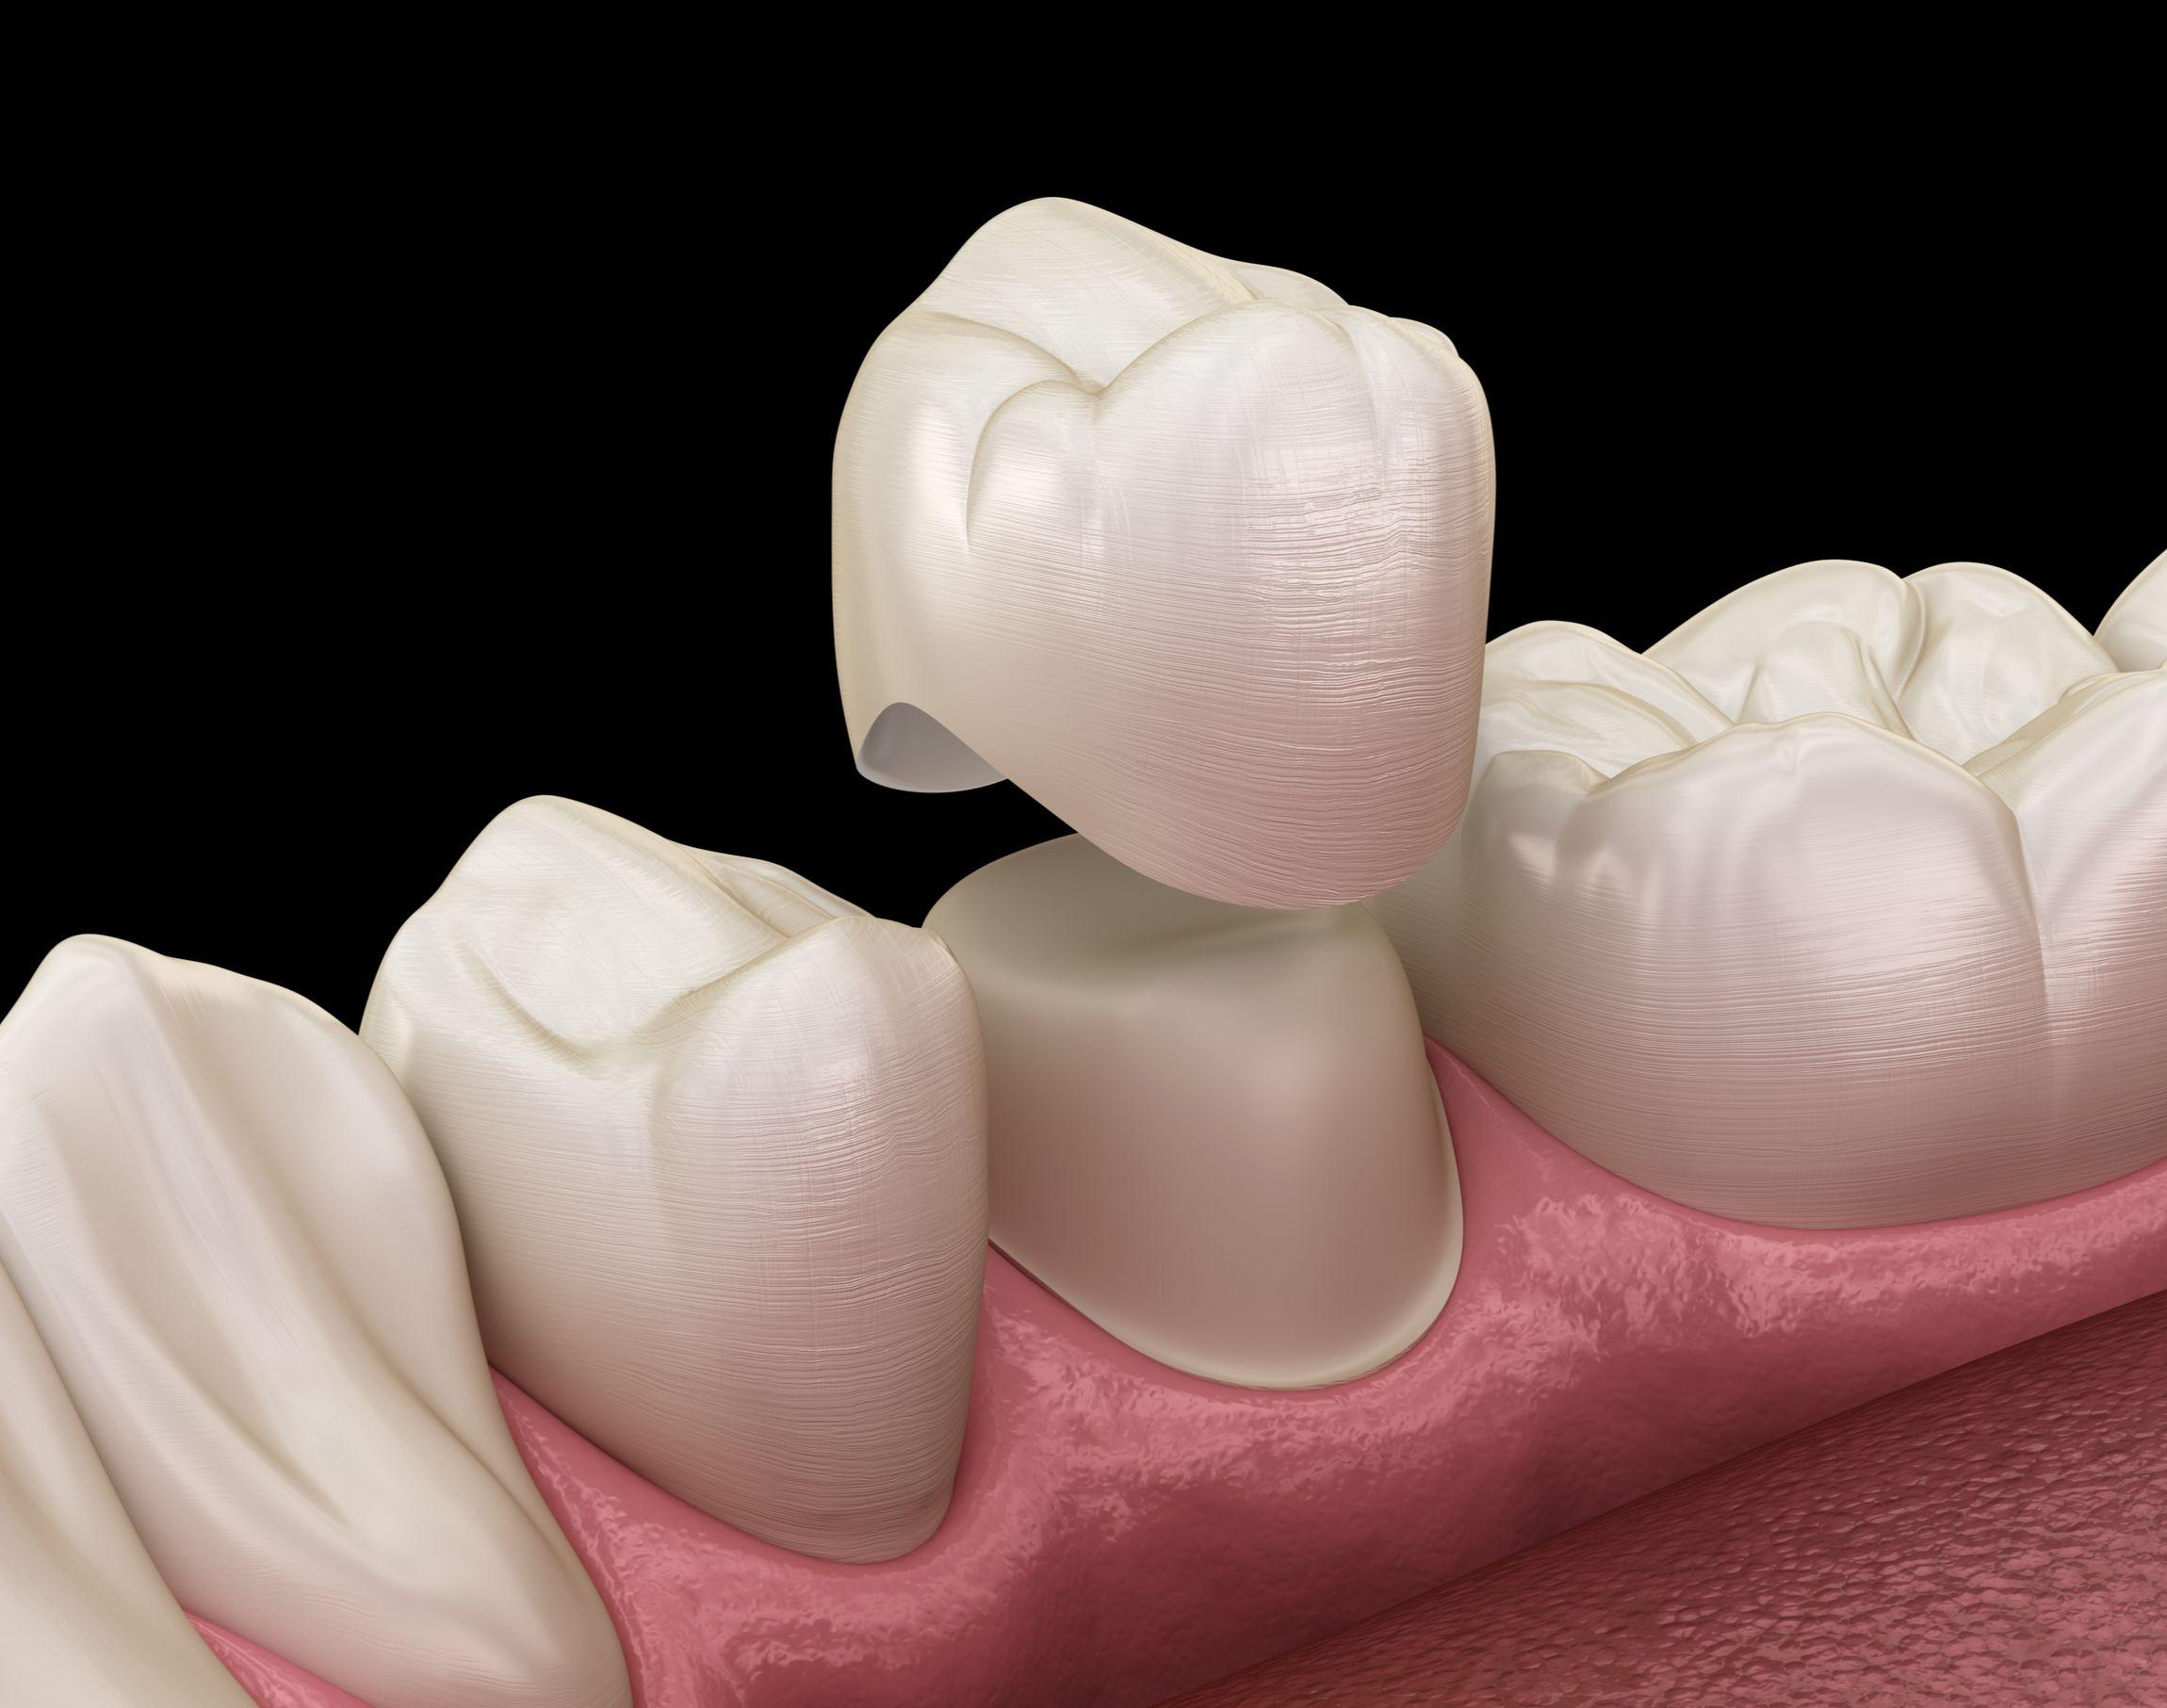 Dental crowns Santa monica